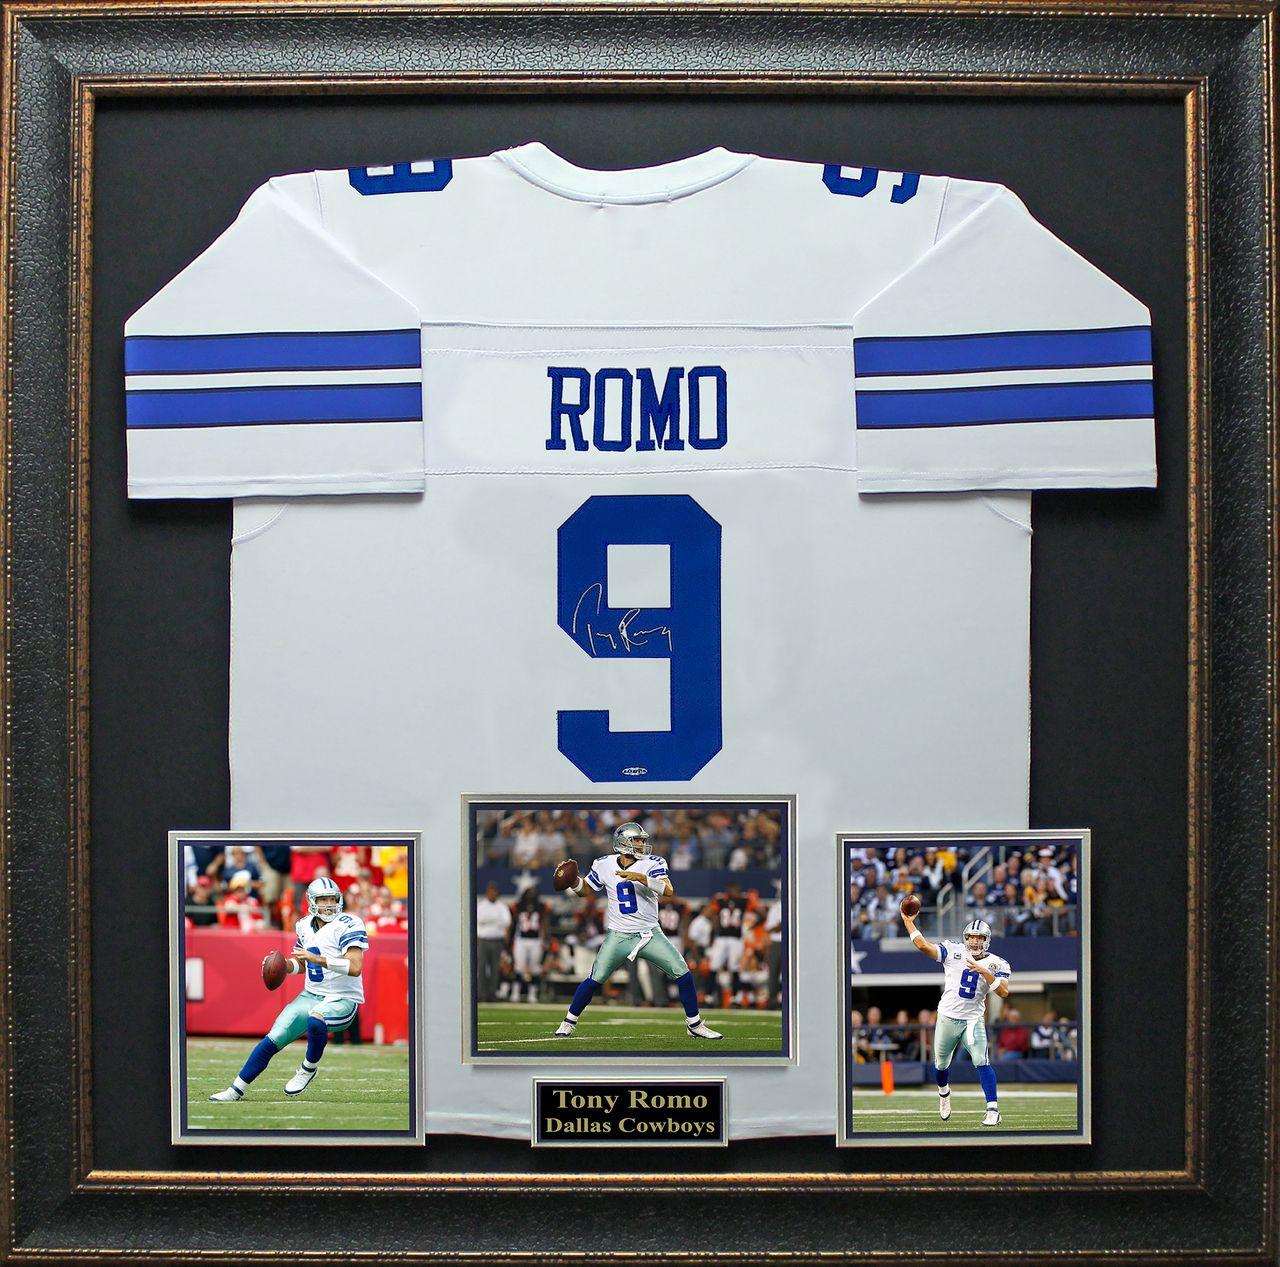 524dd652a ... Signature Royale - Tony Romo Signed Dallas Cowboys Jersey Framed  Display dallascowboys. cowboynation